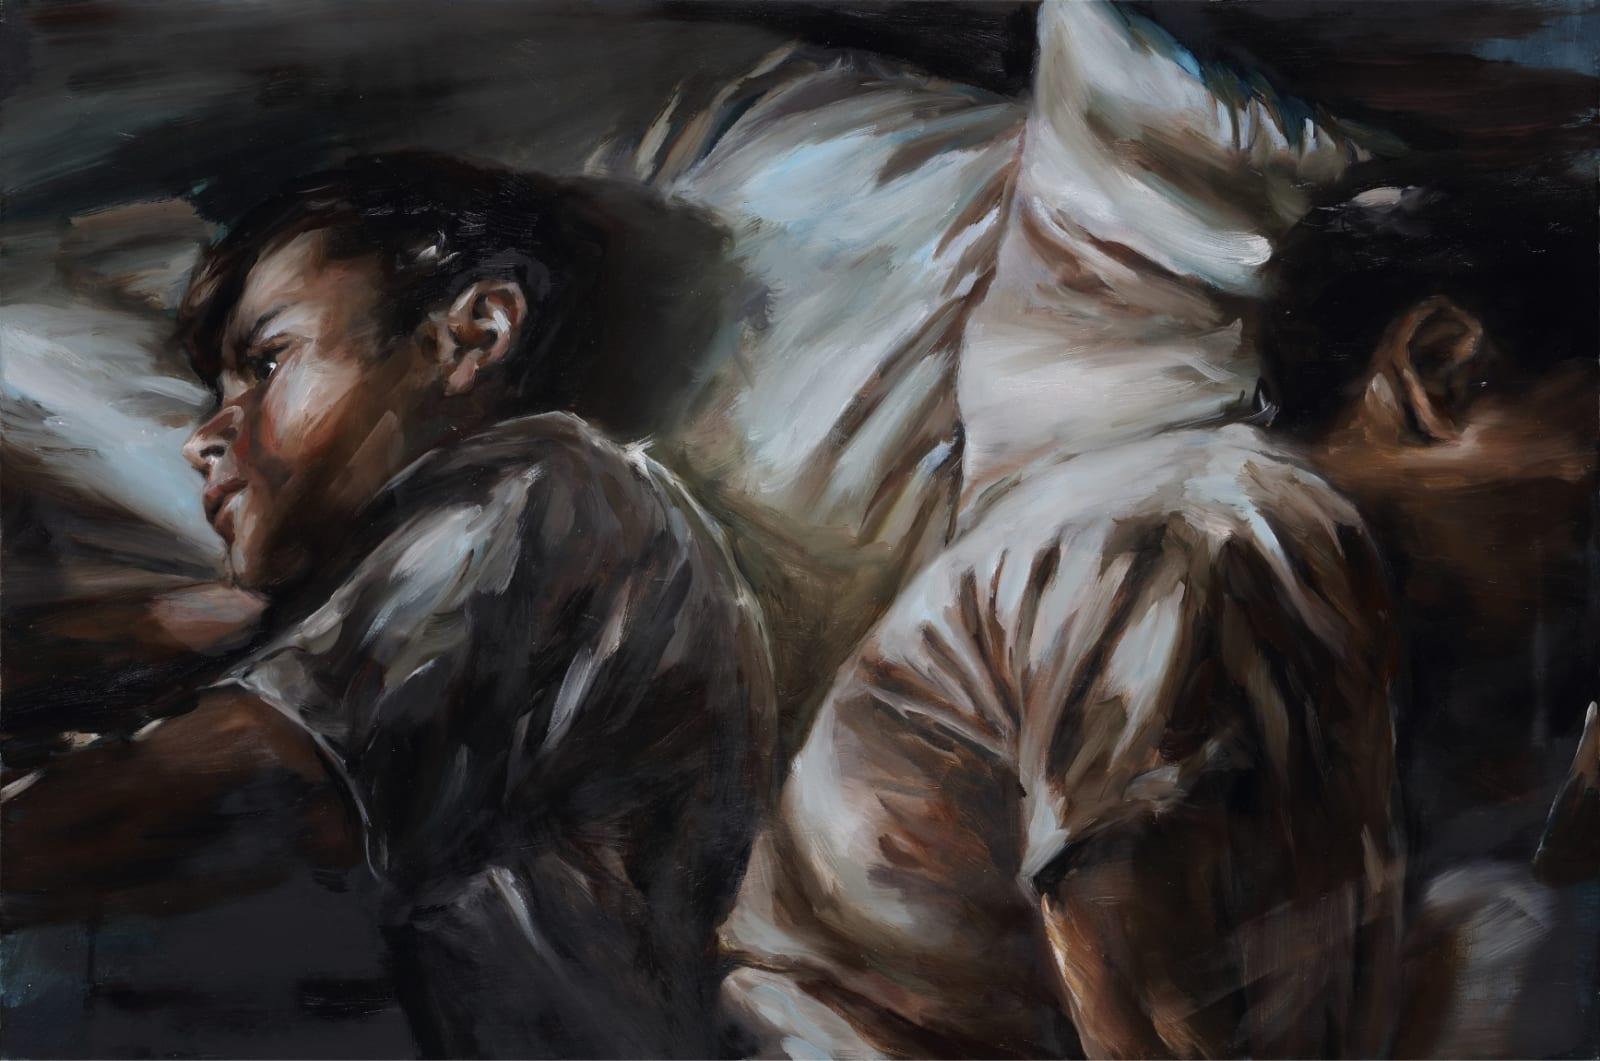 Chen Han x Gideon Rubin|Emotional Fragments